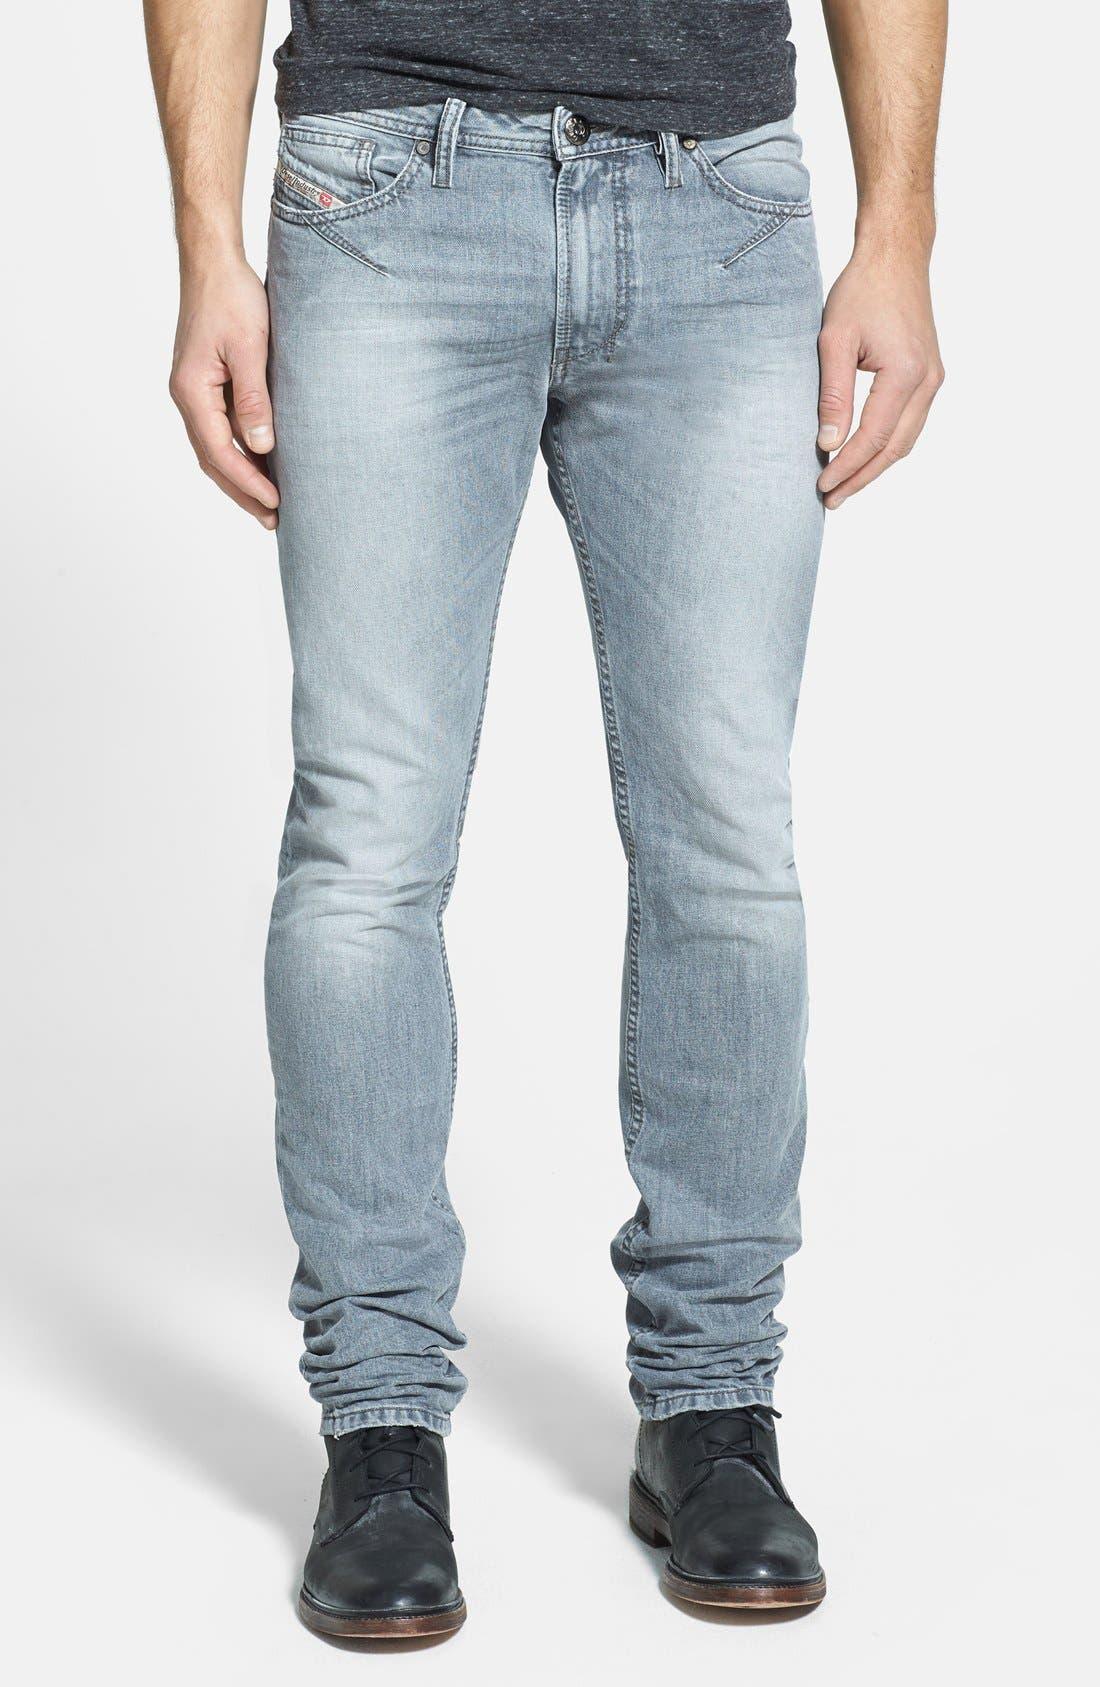 Alternate Image 1 Selected - DIESEL® 'Shioner' Skinny Fit Jeans (Black)